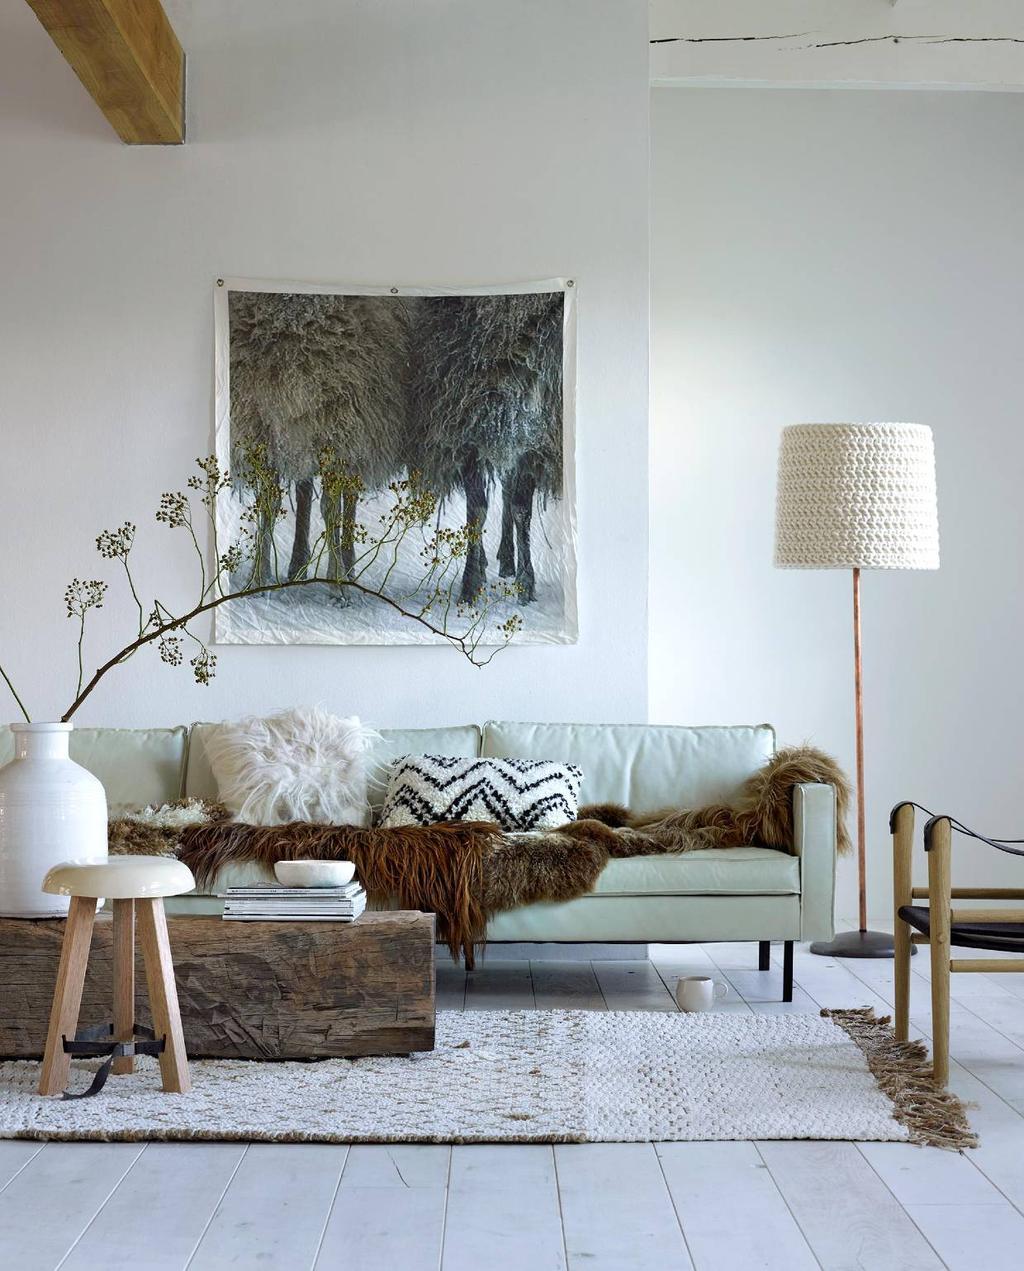 Stylingles van vtwonen stylist Marianne Luning